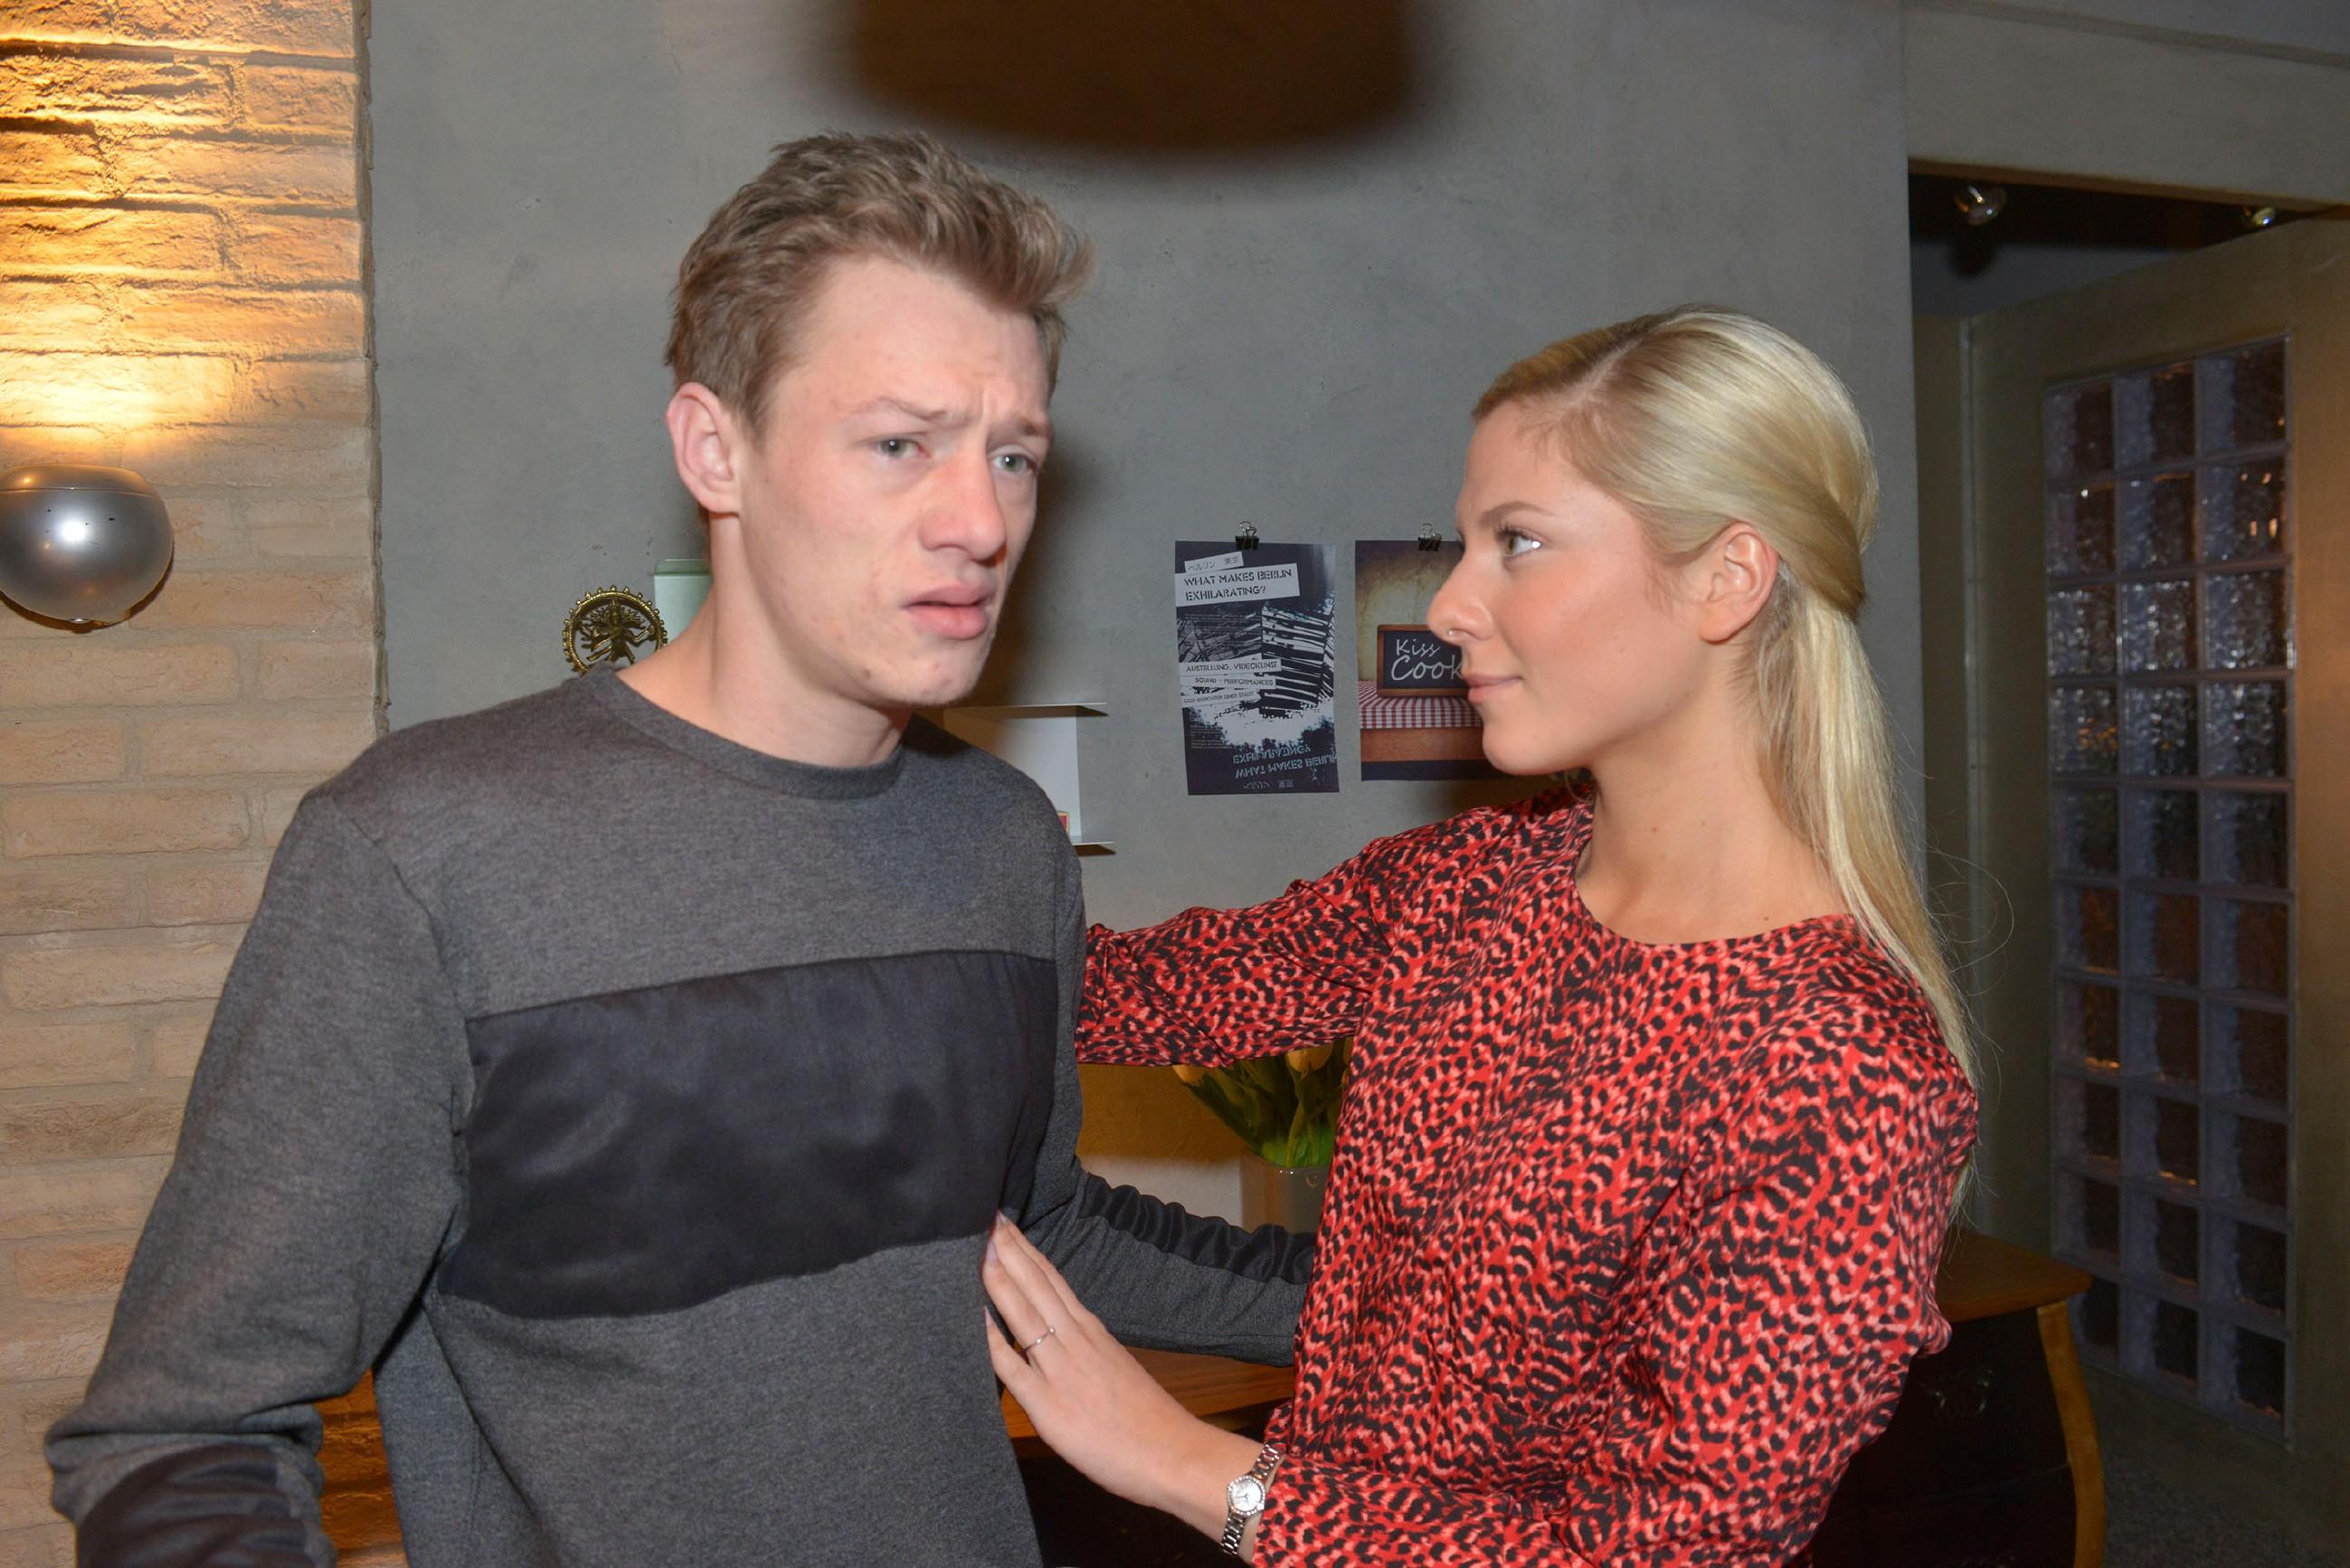 Sunny (Valentina Pahde) versucht Vince (Vincent Krüger) vor der Koch-Bewährungsprobe Mut zuzusprechen.